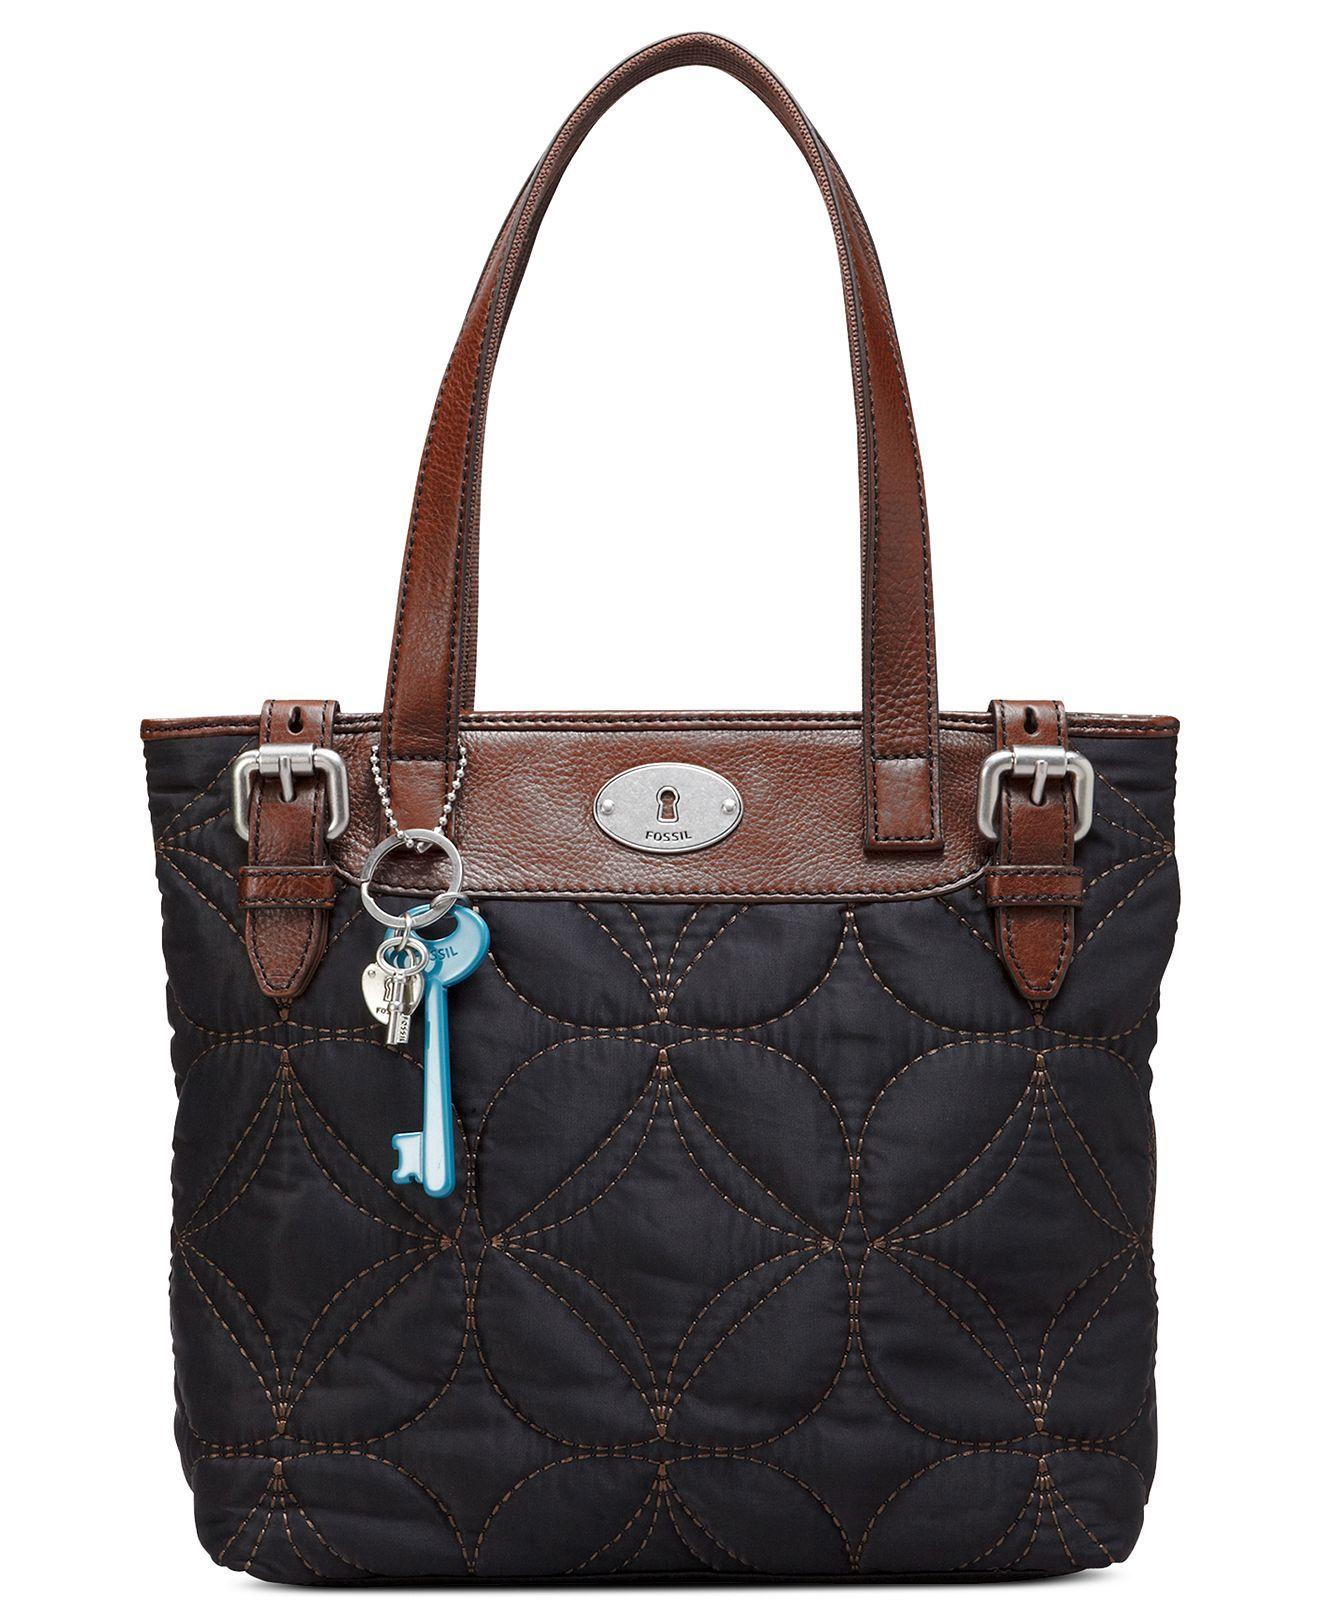 Black Fossil Handbag Key Per Nylon Macy S Online Tote Bags